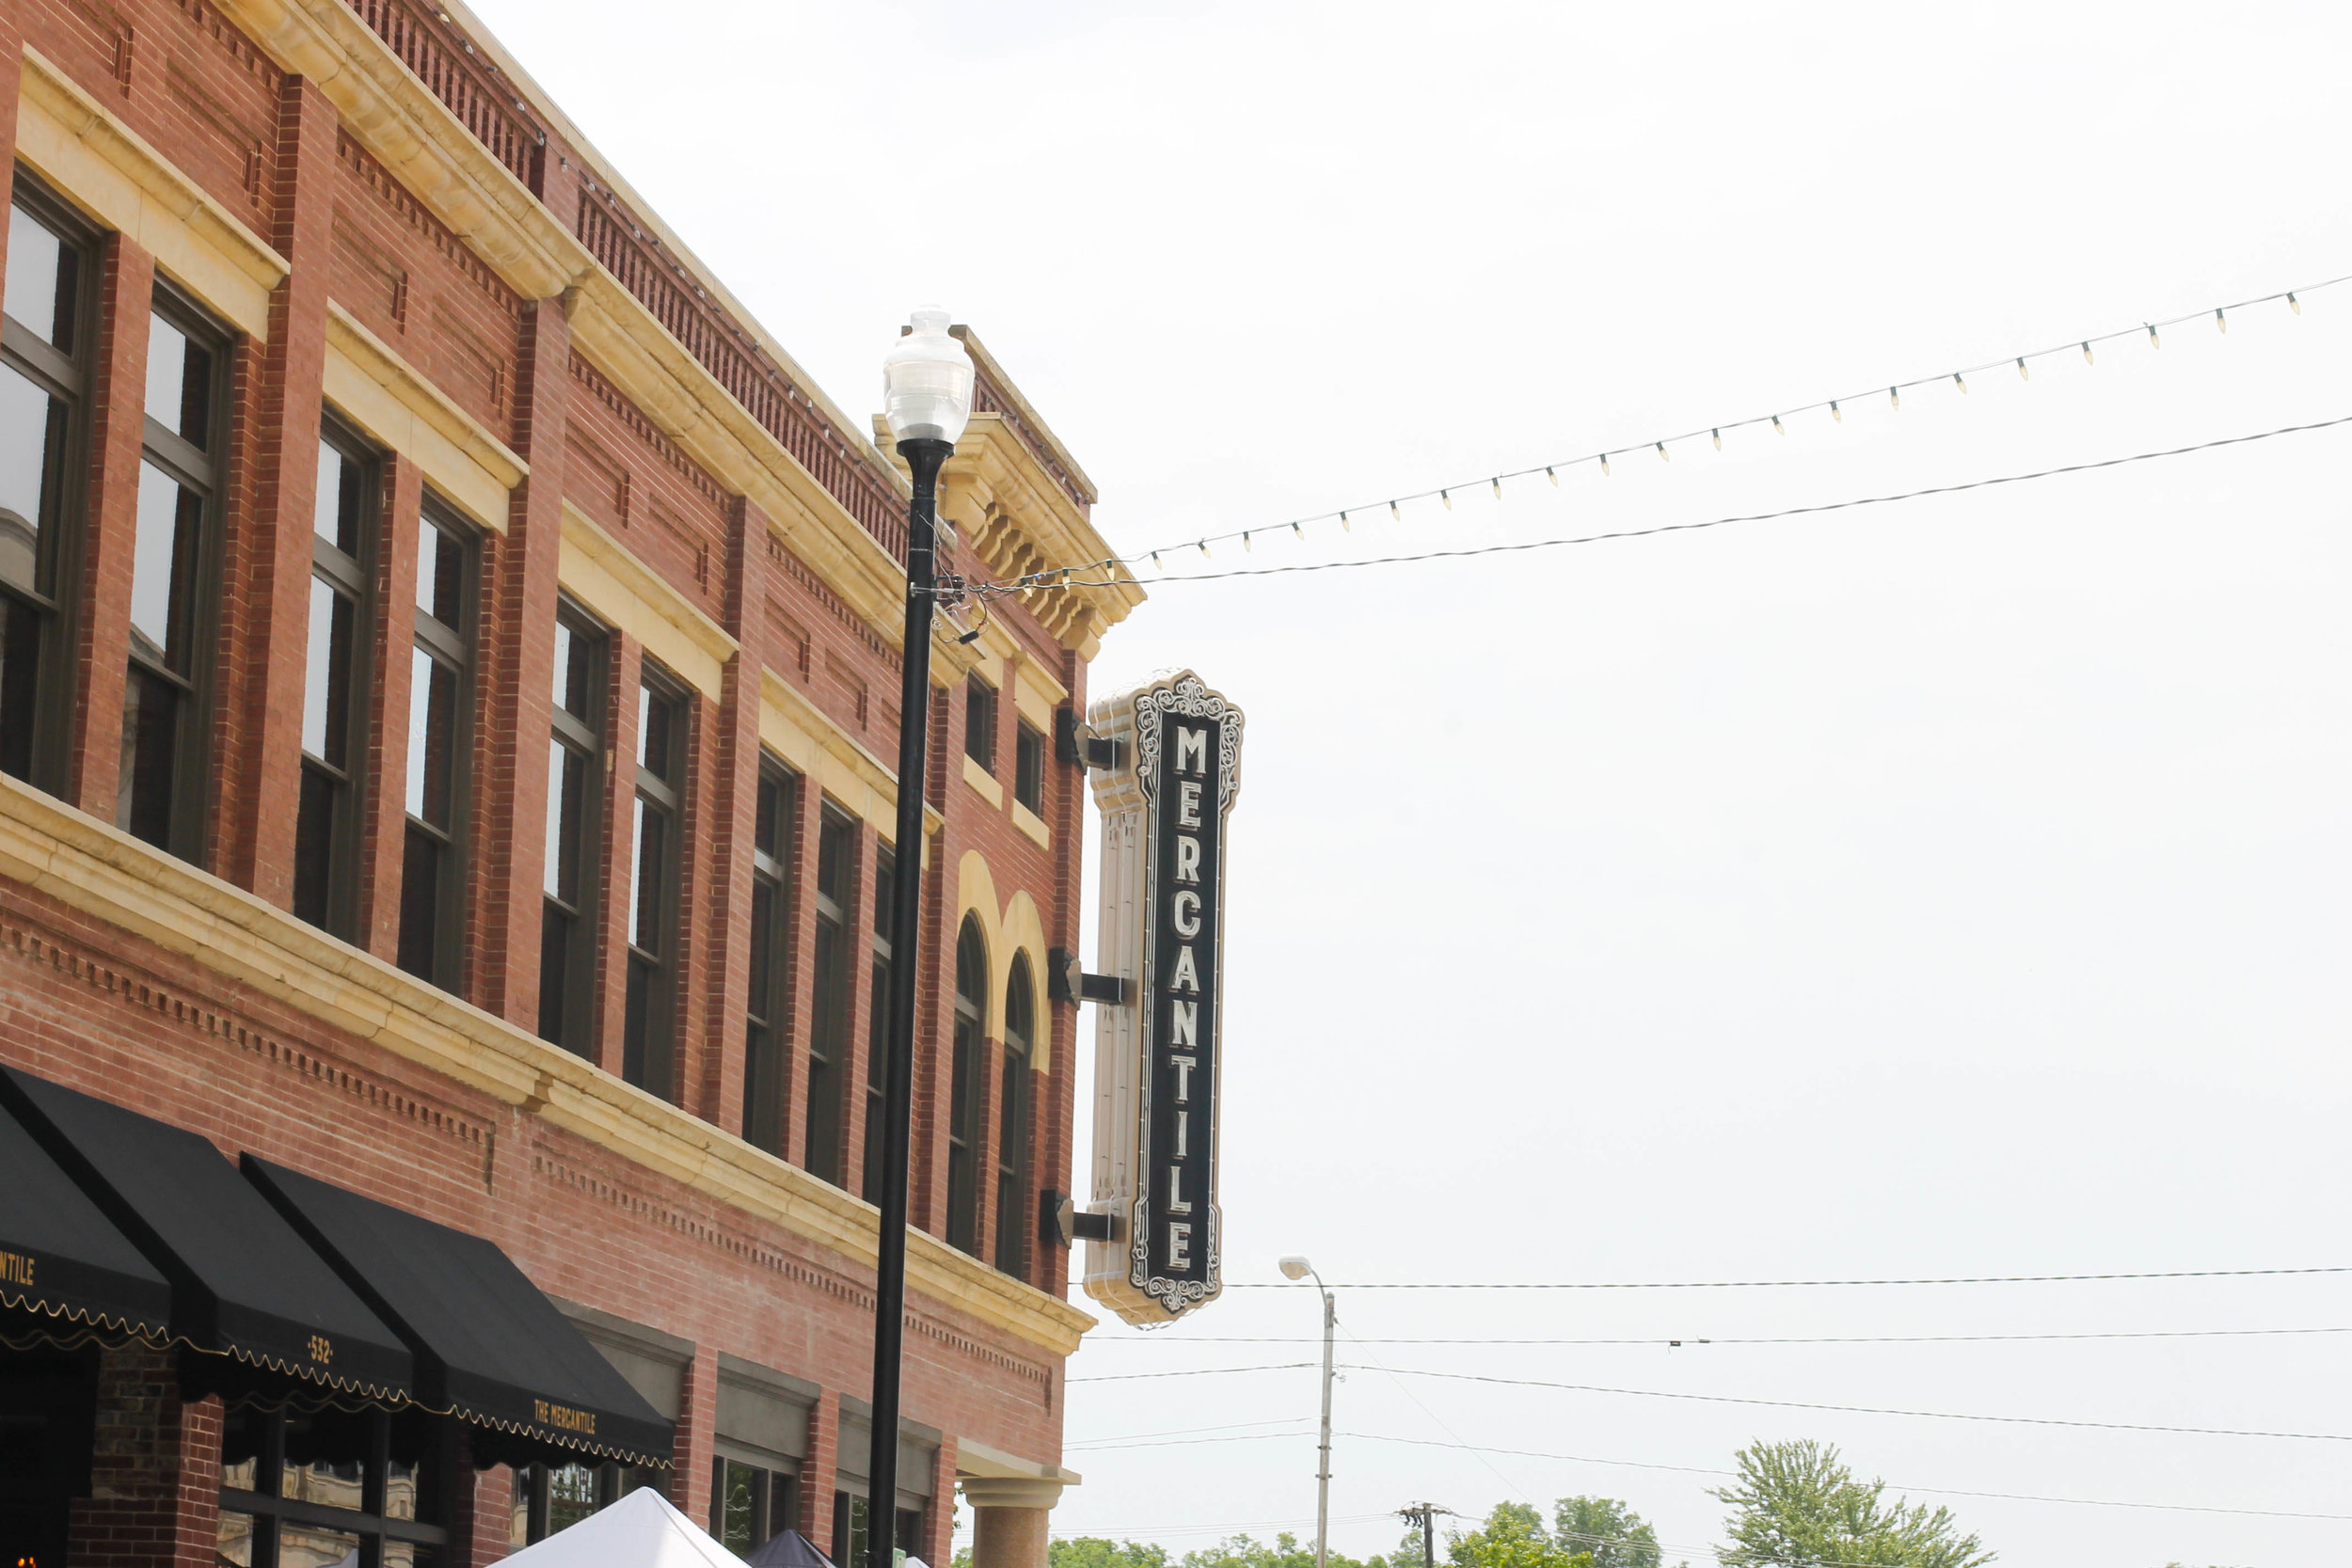 The Mercantile, Pawhuska